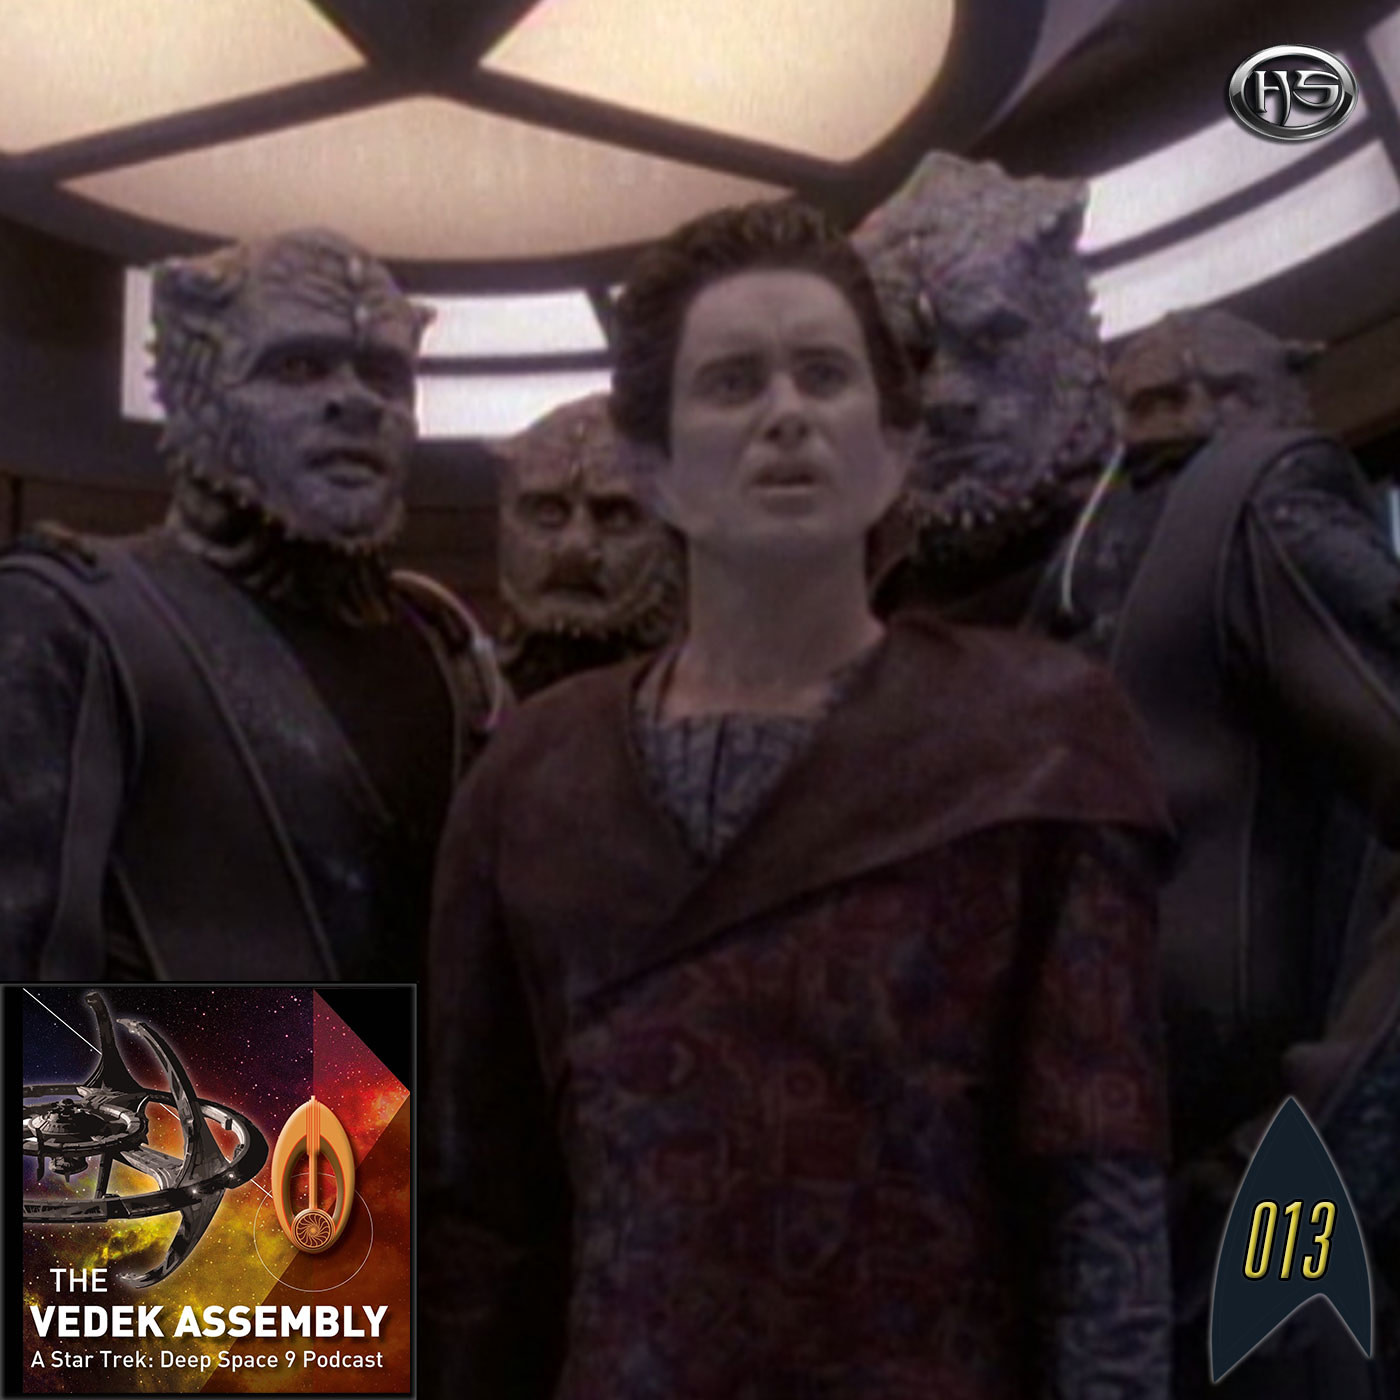 The Vedek Assembly Episode 13